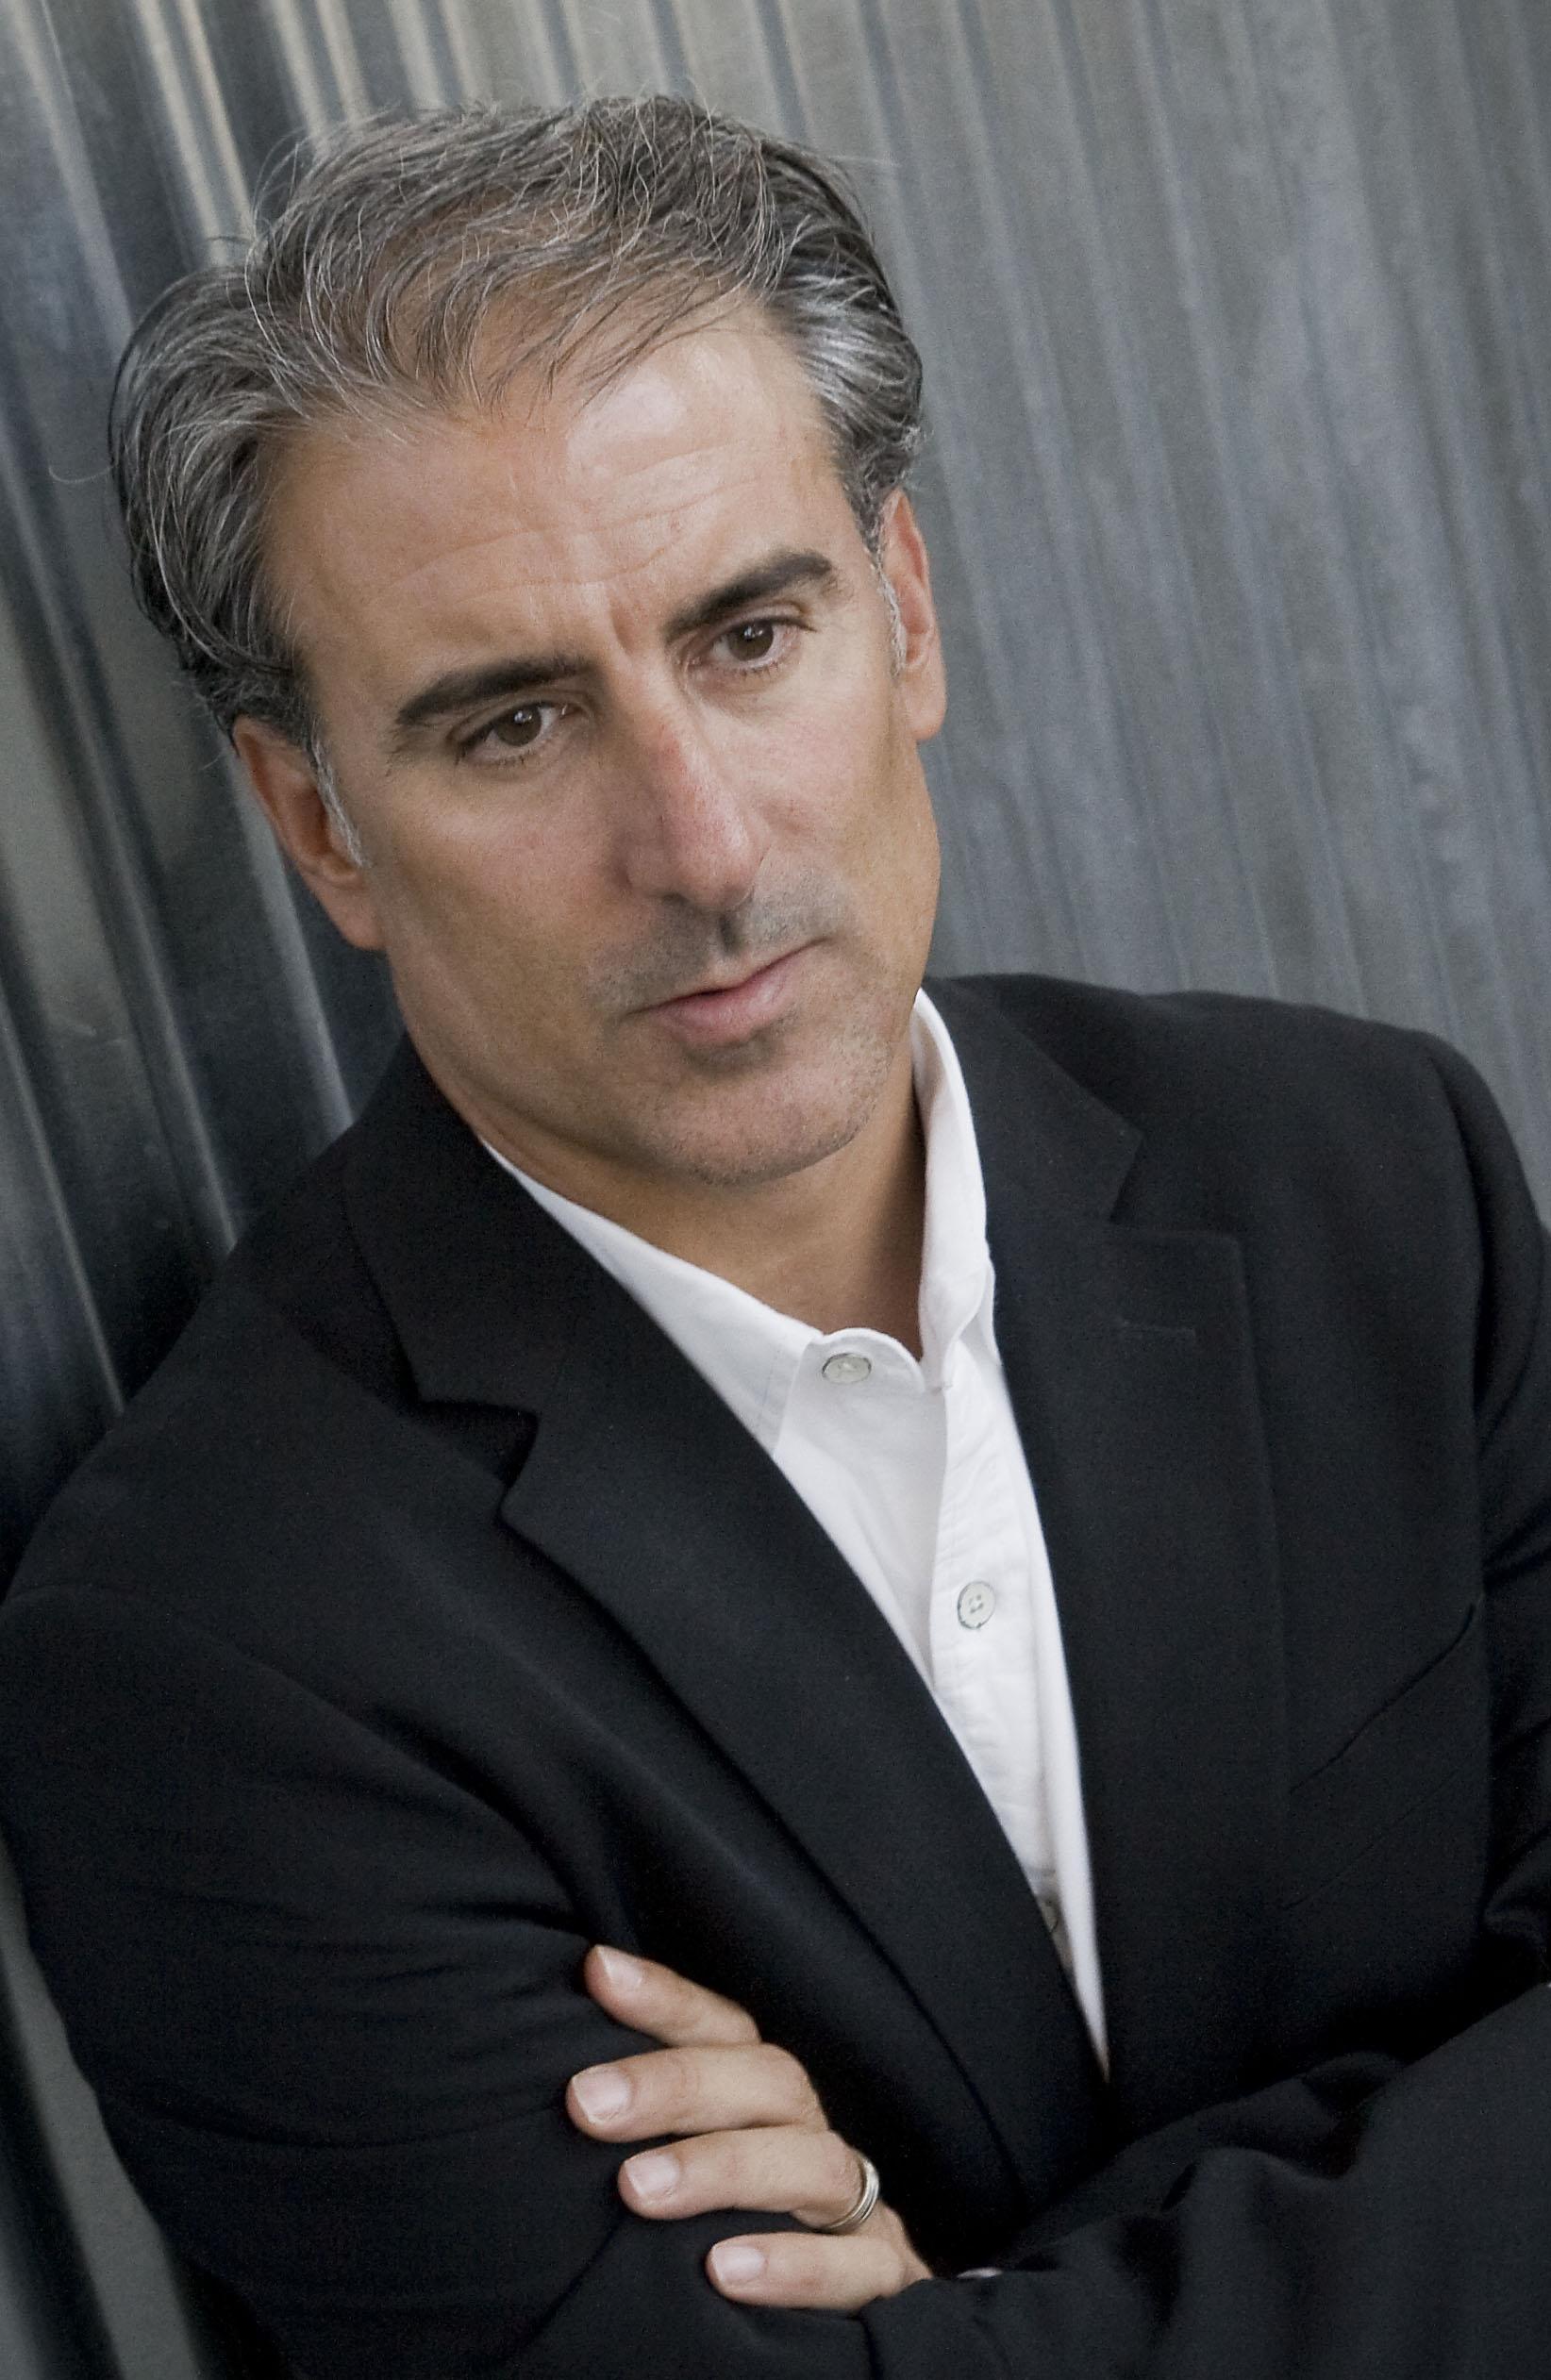 Dean Trevelino